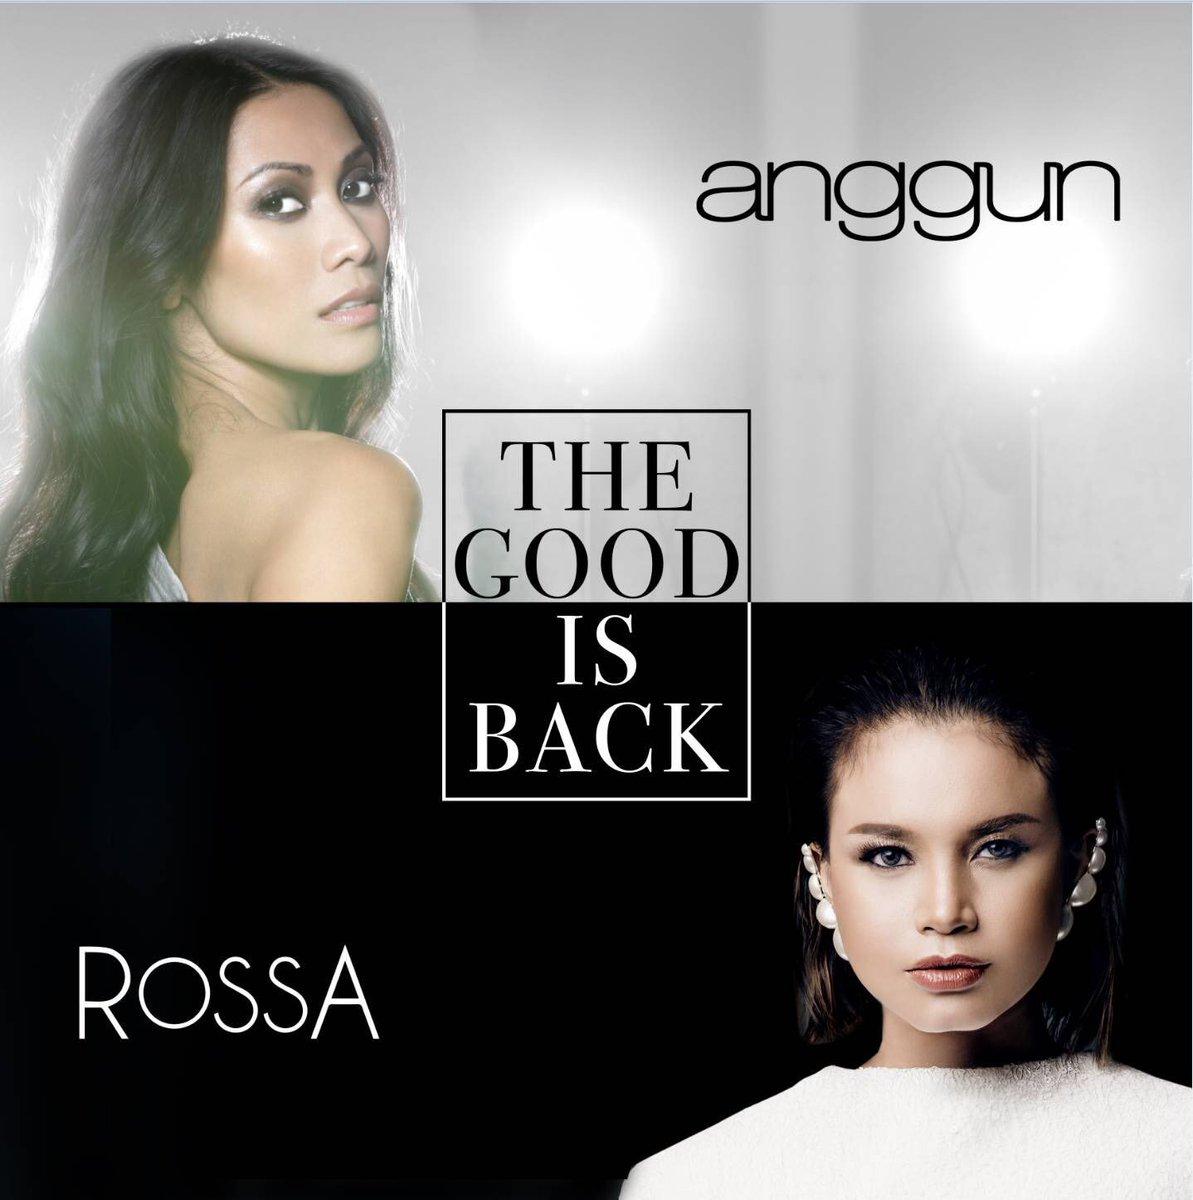 Single baru #TheGoodIsBack duet dengan the super talented @mynameisrossa 💝💝 available now, taken from my album #8 SPOTIFY https://t.co/SAe8xdQgnW APPLE https://t.co/ptAU32DGHA KKBOX https://t.co/9qkSVU39yY